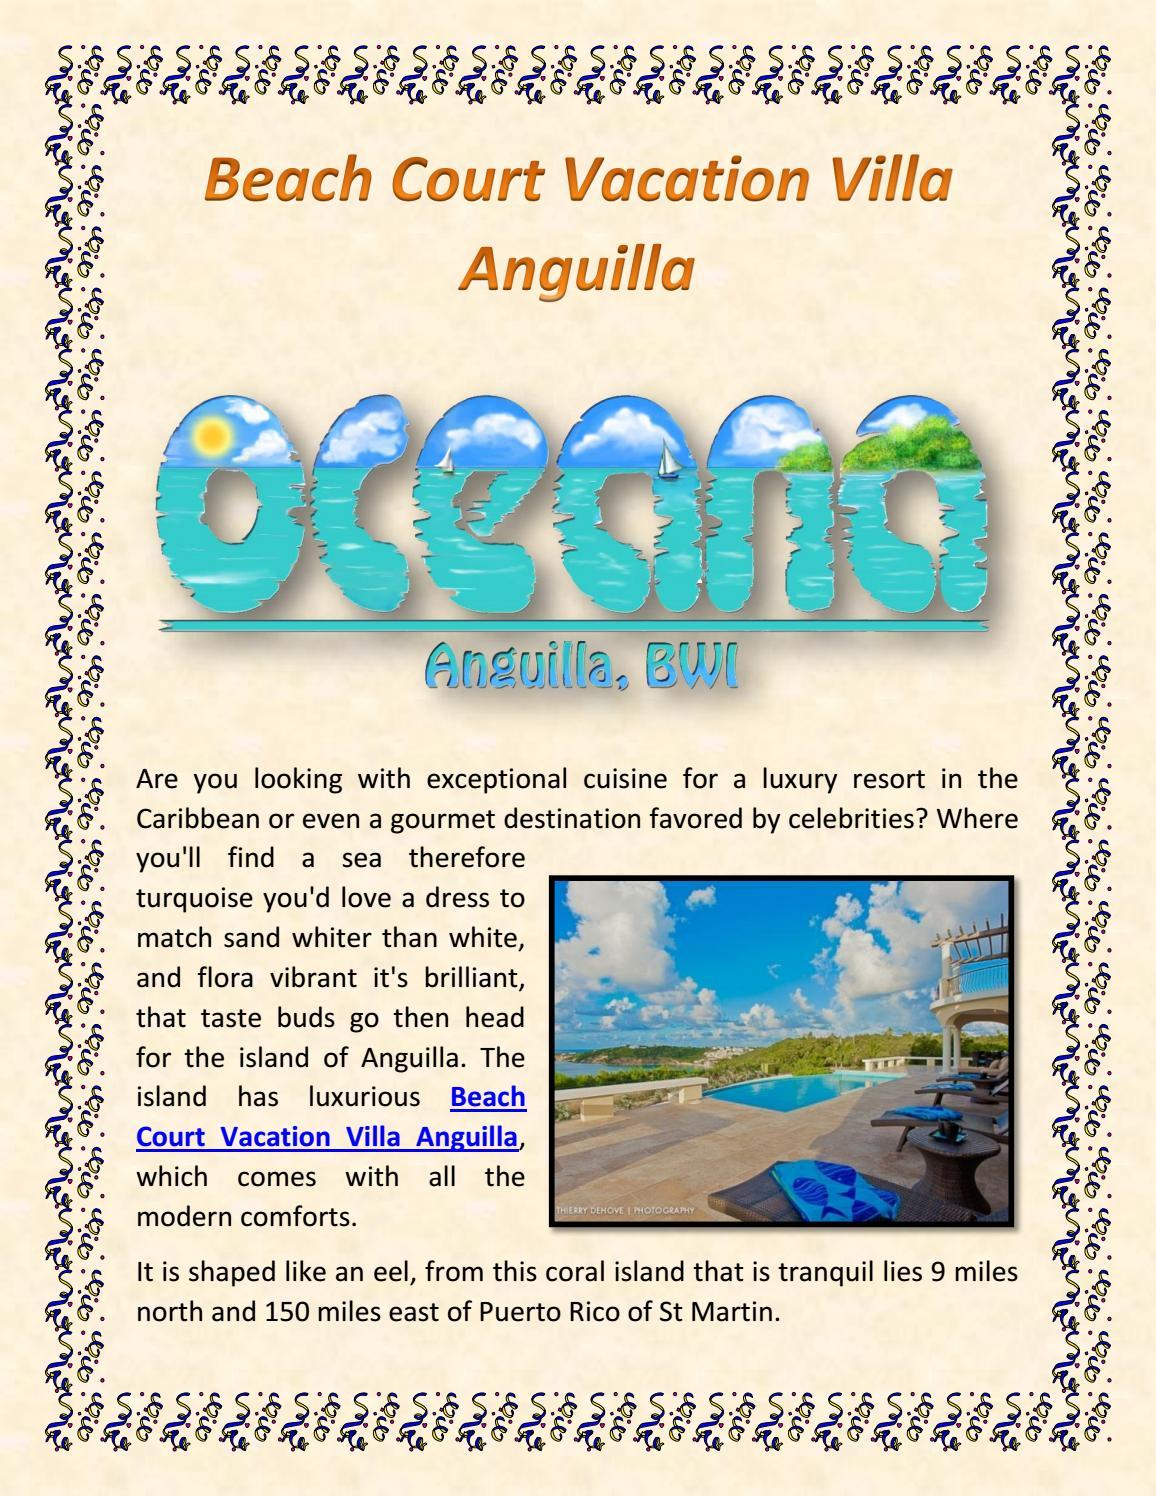 Beach Court Vacation Villa Anguilla